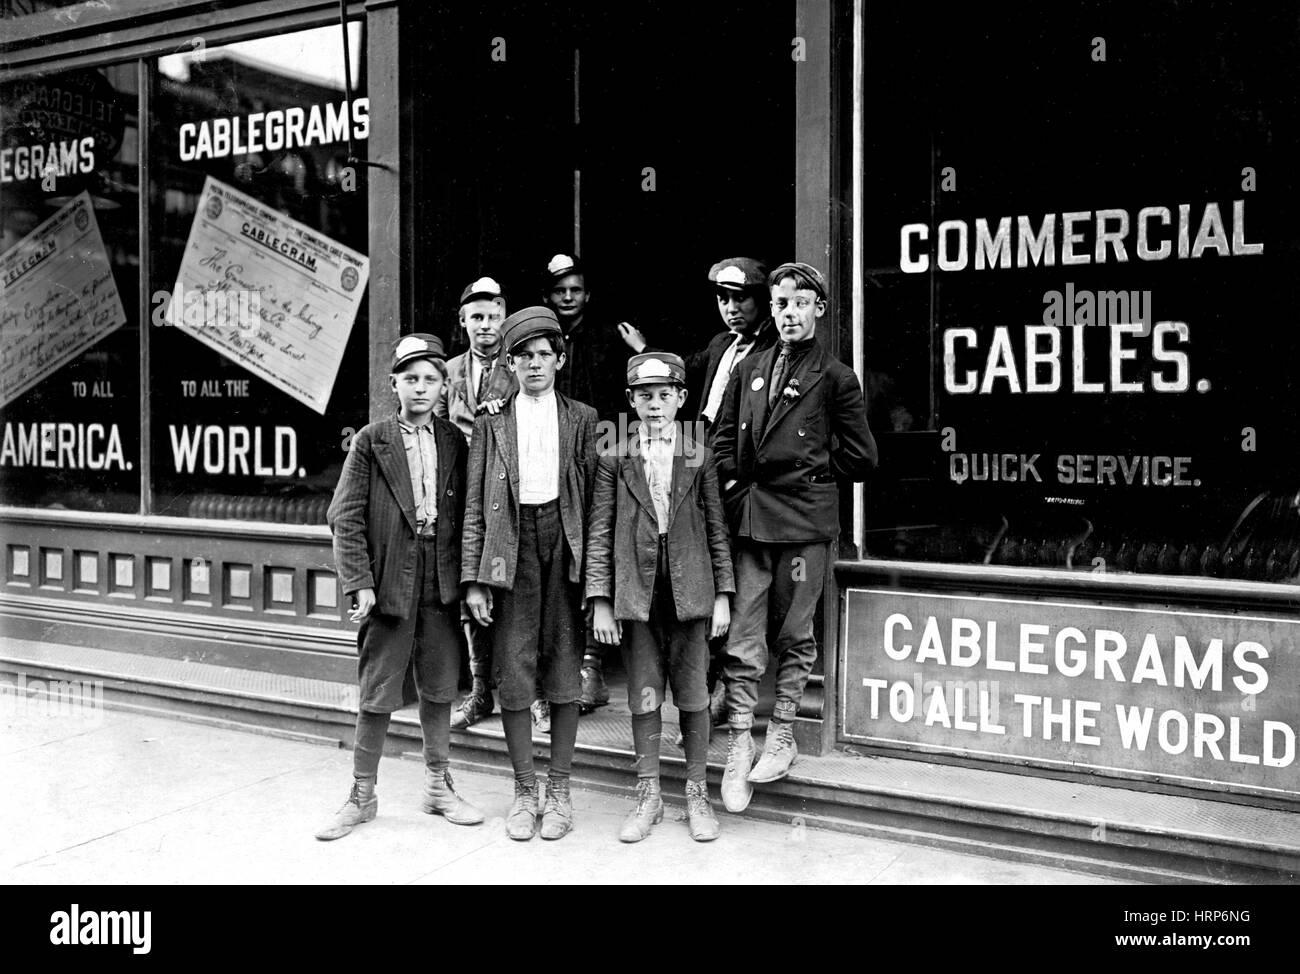 Postal Telegraph Messengers, Lewis Hine, 1908 Stock Photo